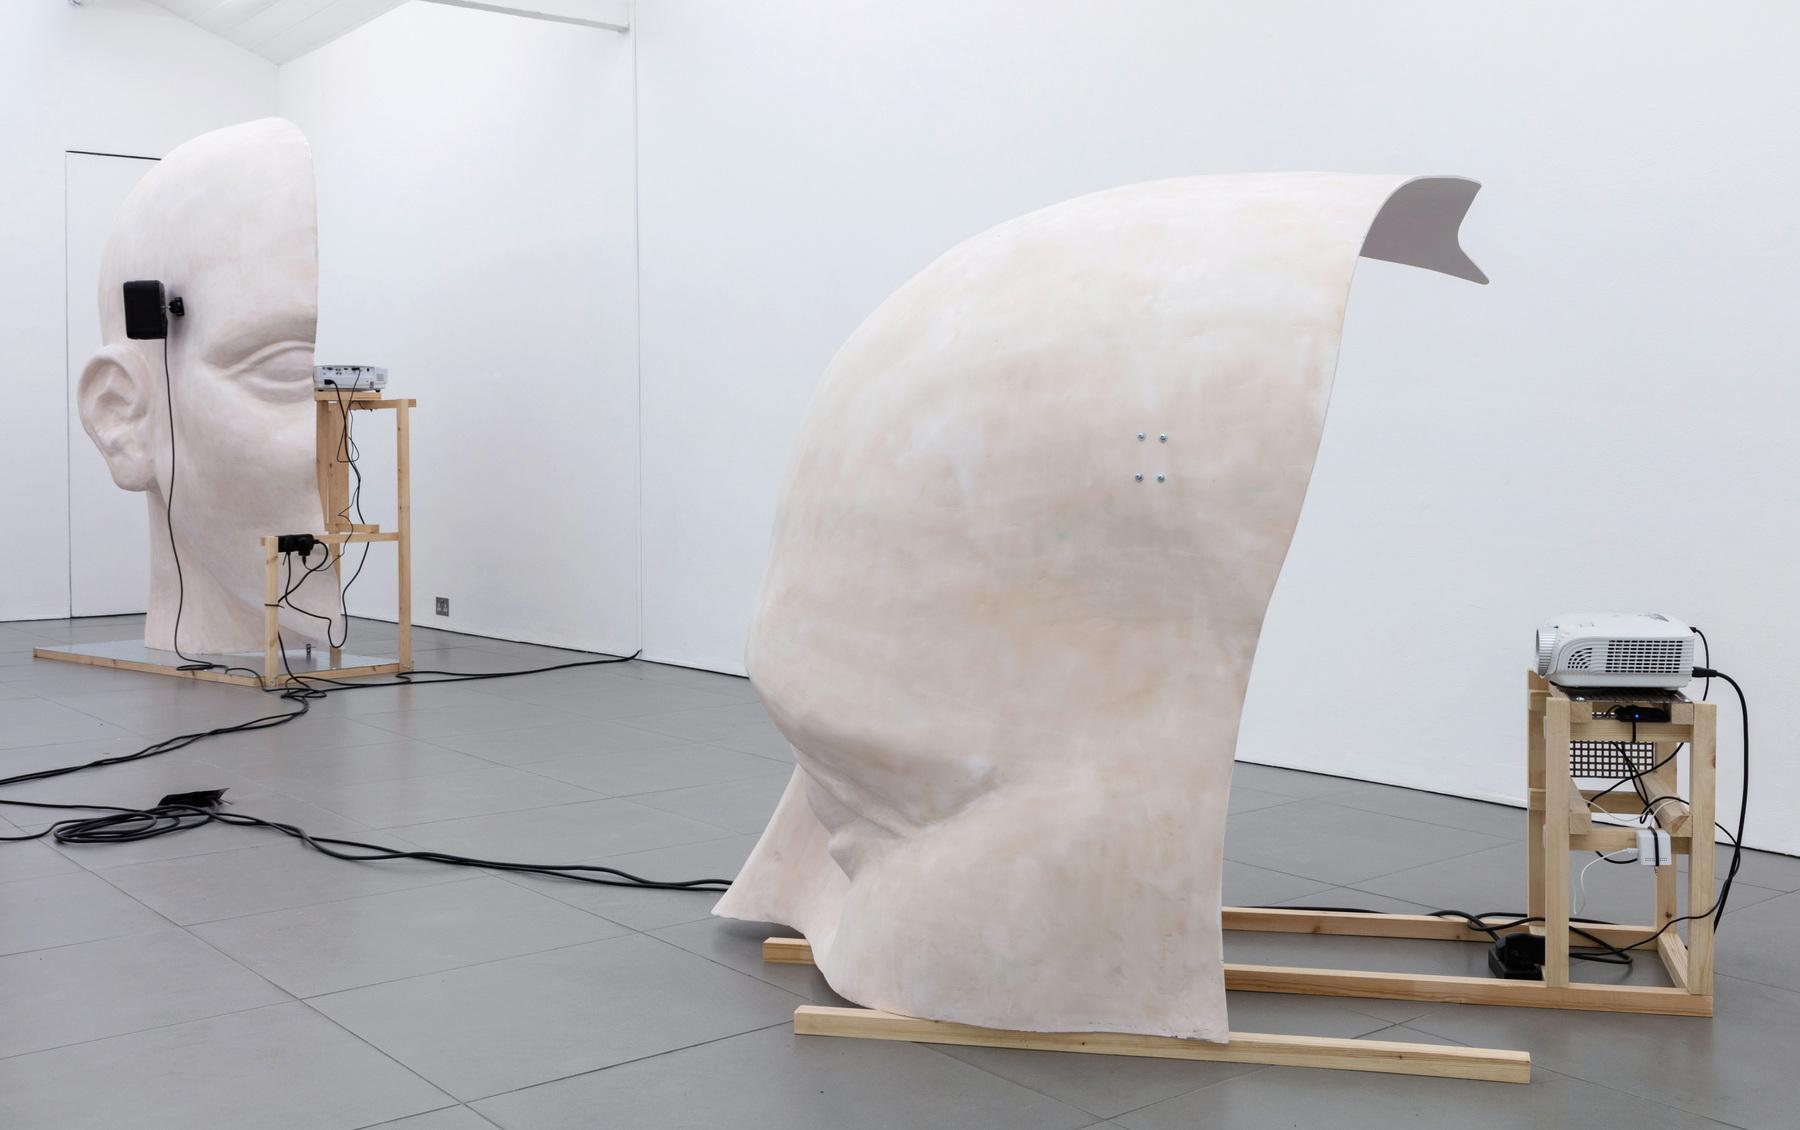 13. Anne de Vries, SUBMISSION 2015, wood, metal, fibreglass resin, audio, video